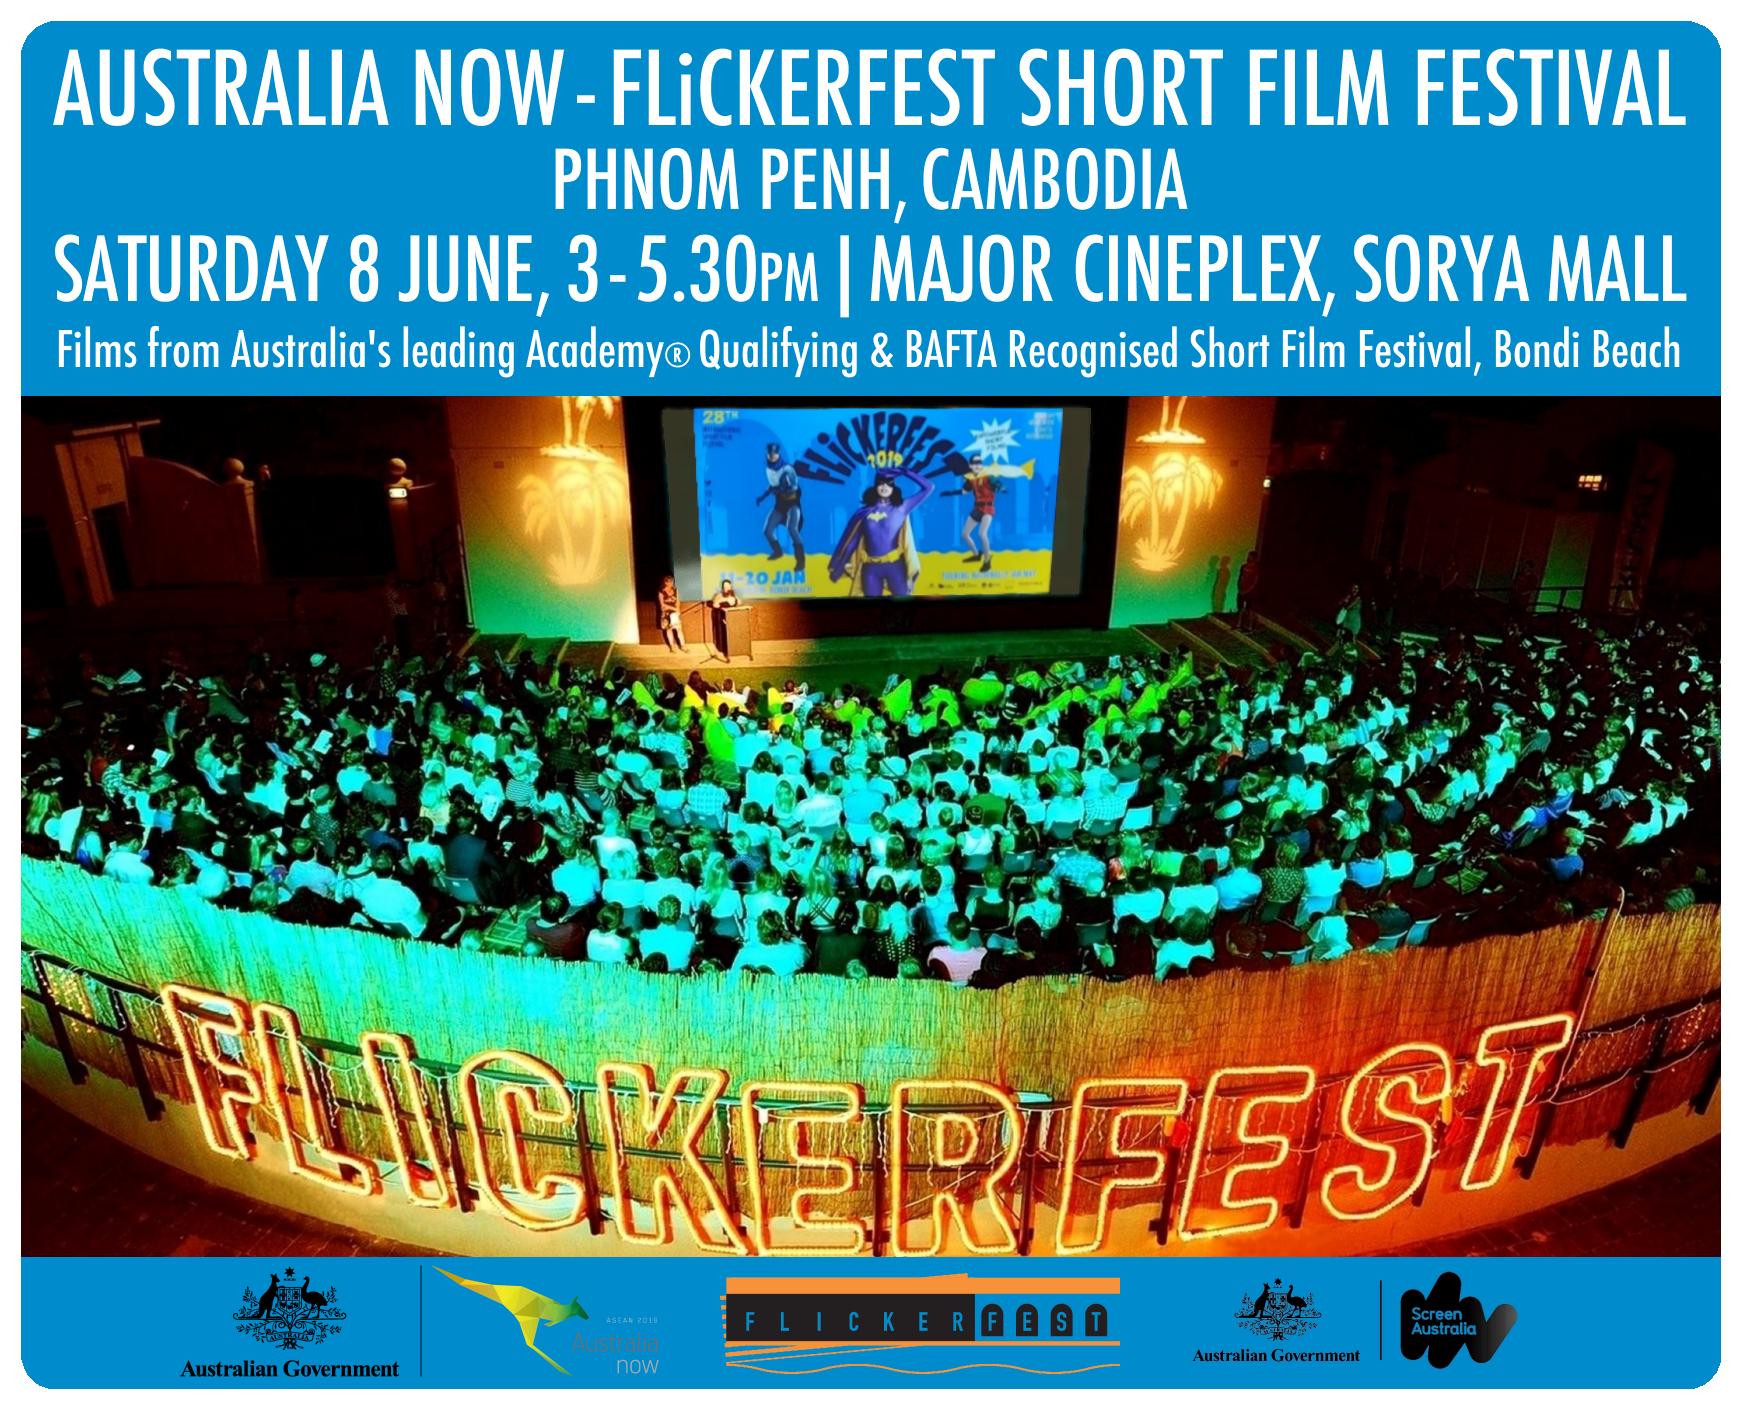 FLiCKERFEST Short Film Festival - Cambodia • Australia Now 2019